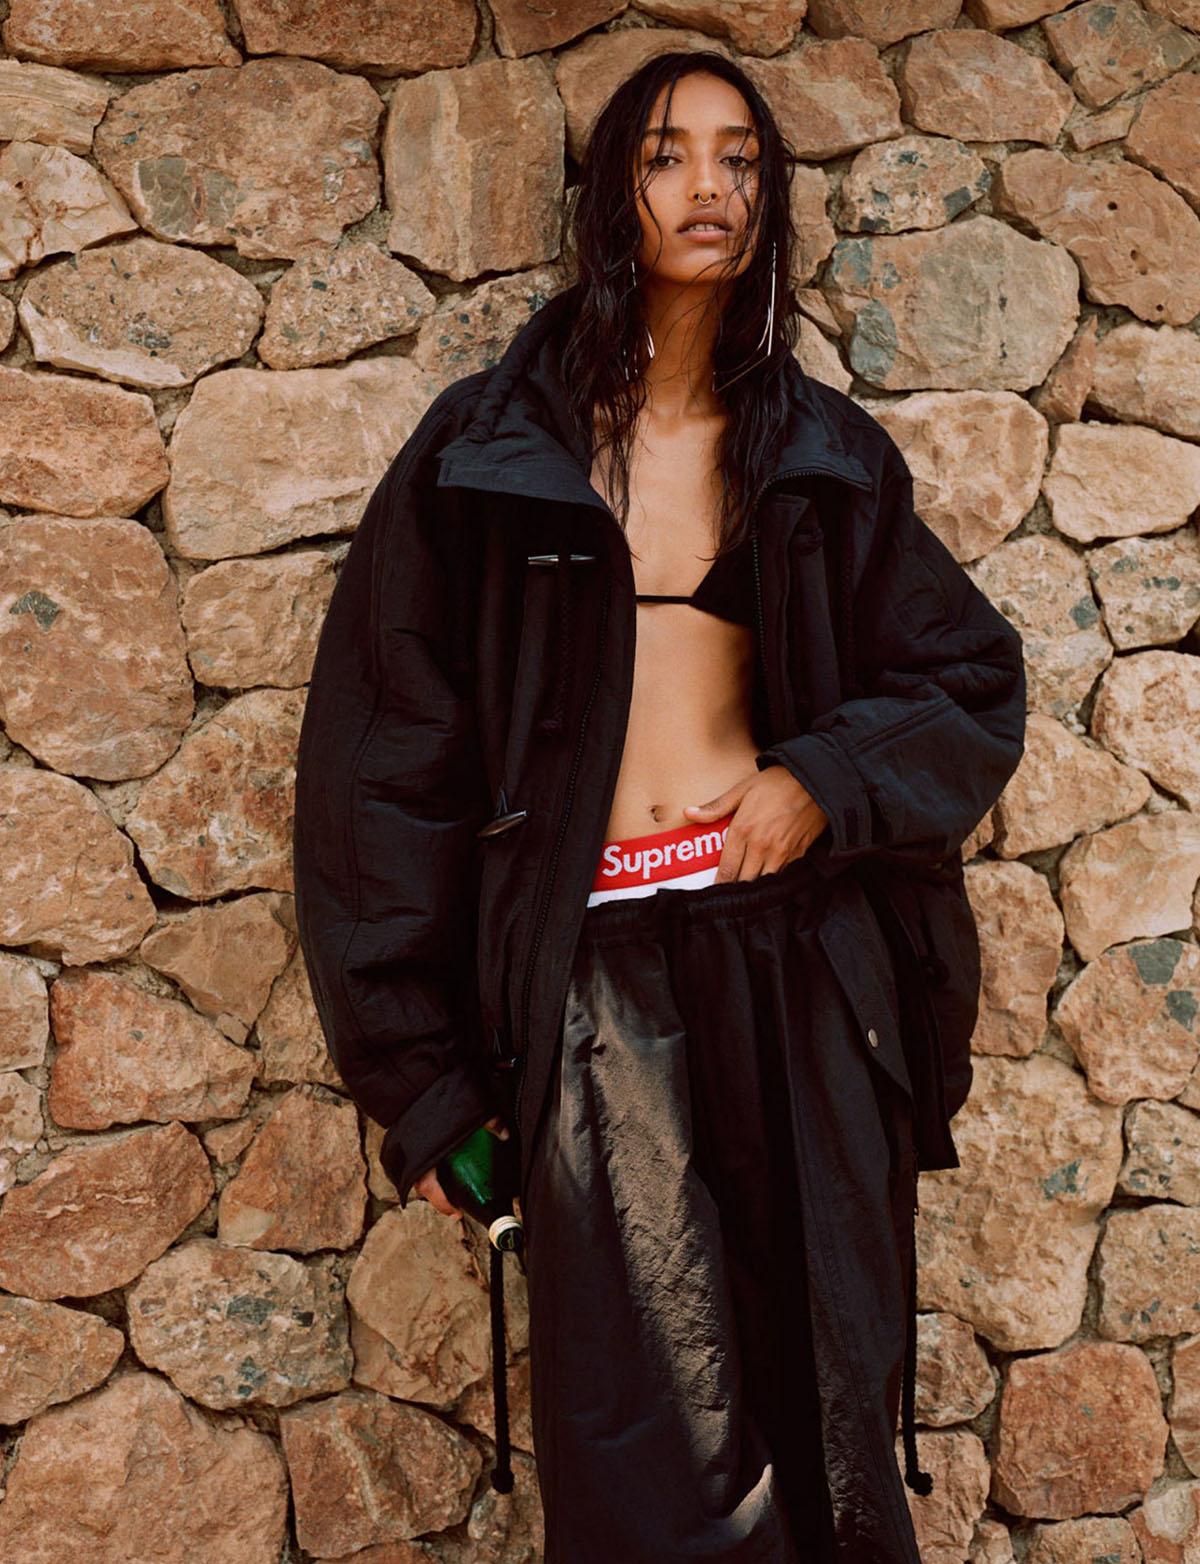 Mona Tougaard by Alasdair McLellan for Vogue Paris August 2021